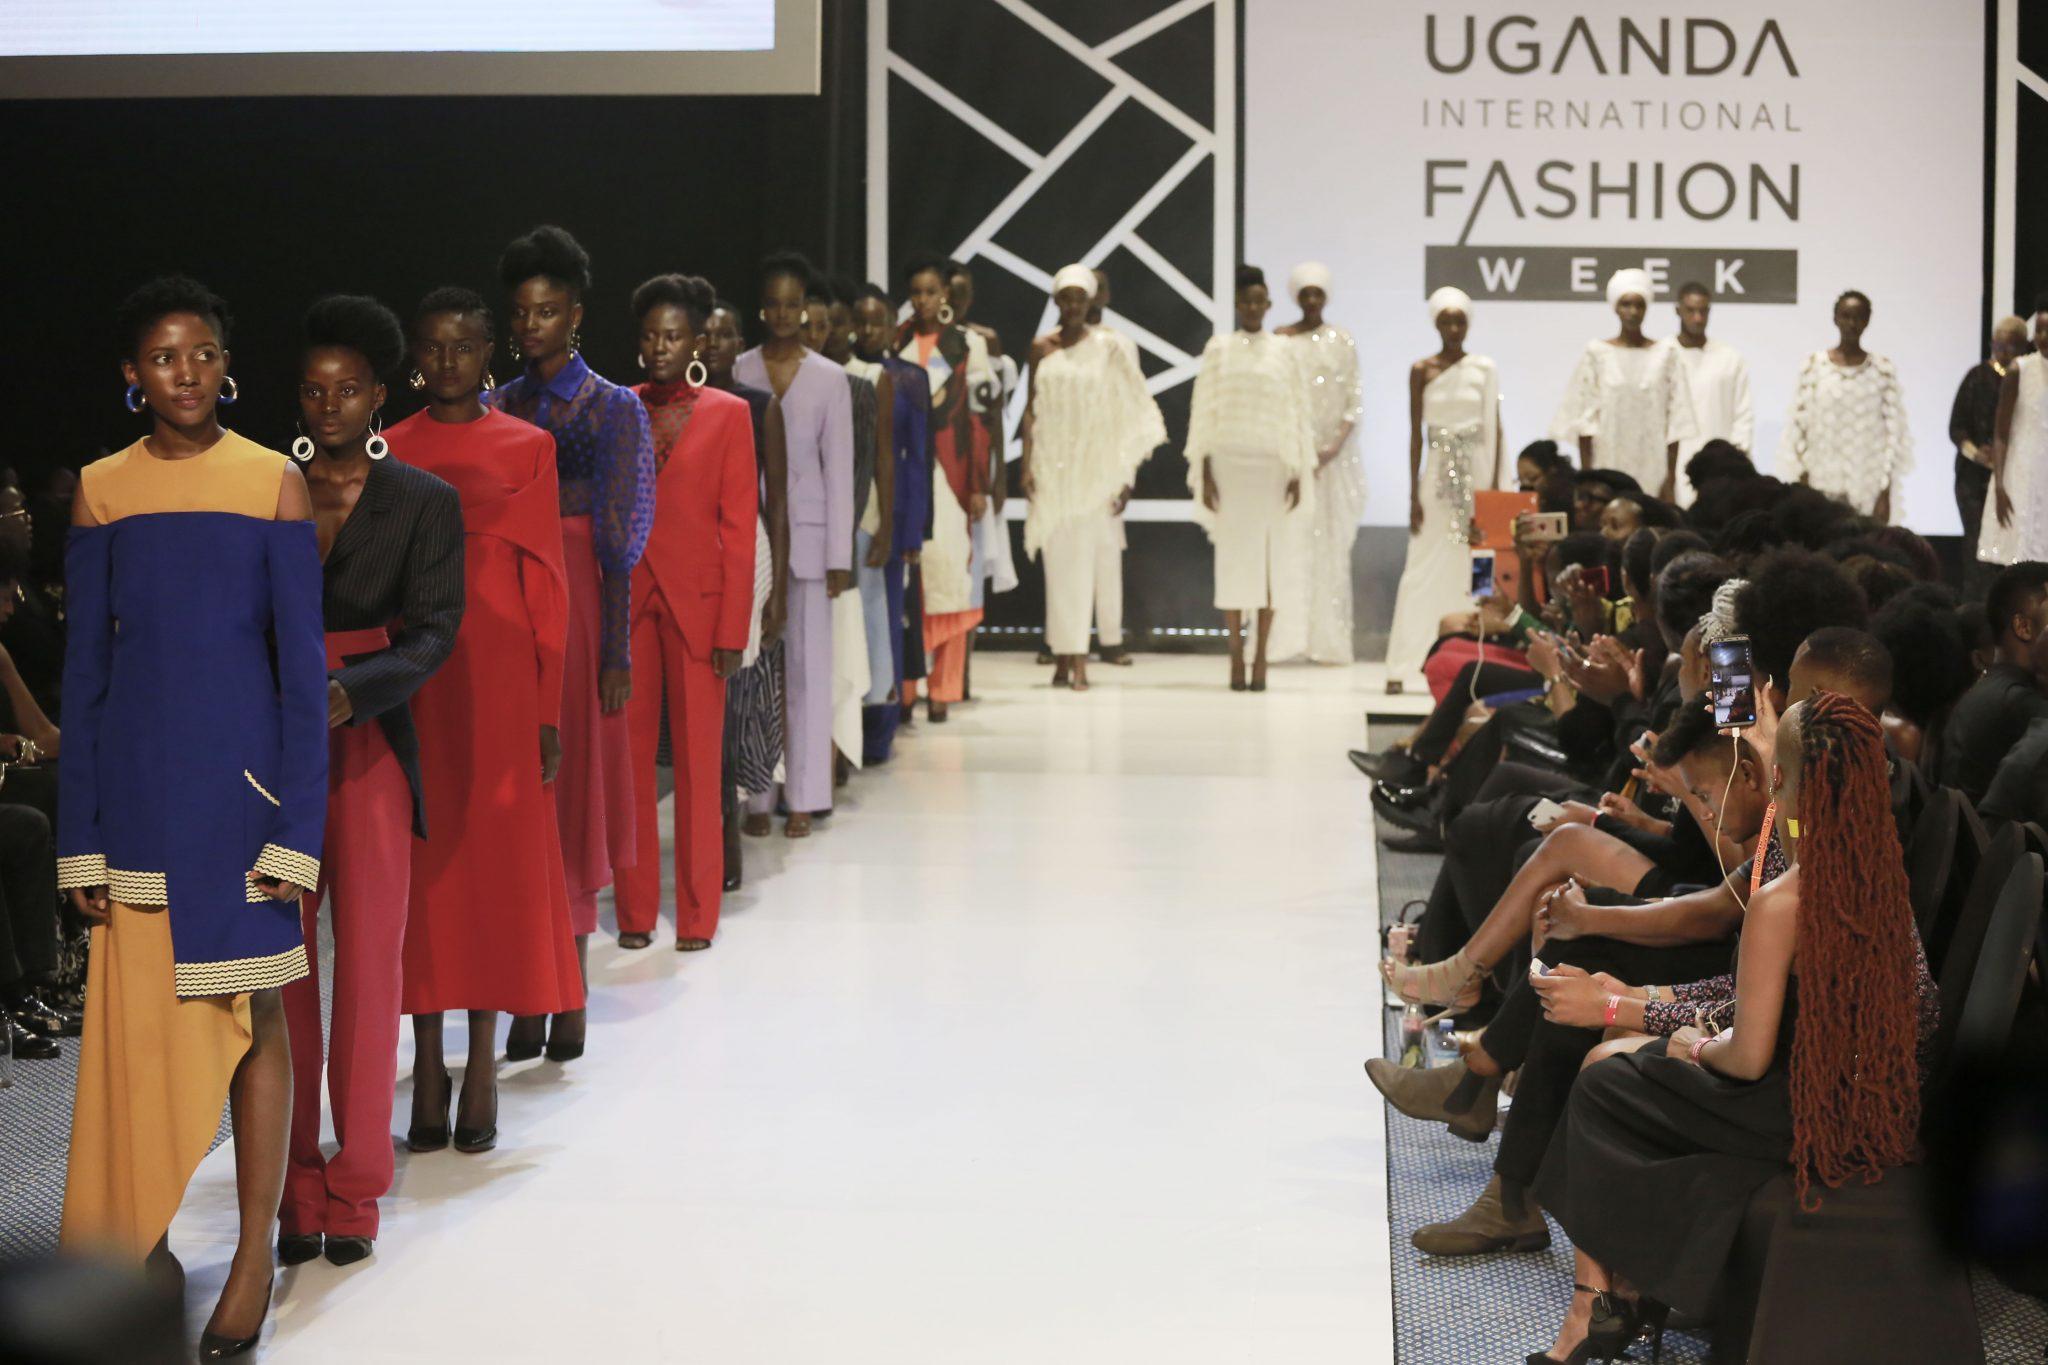 Uganda International Fashion Week 2019 Returns